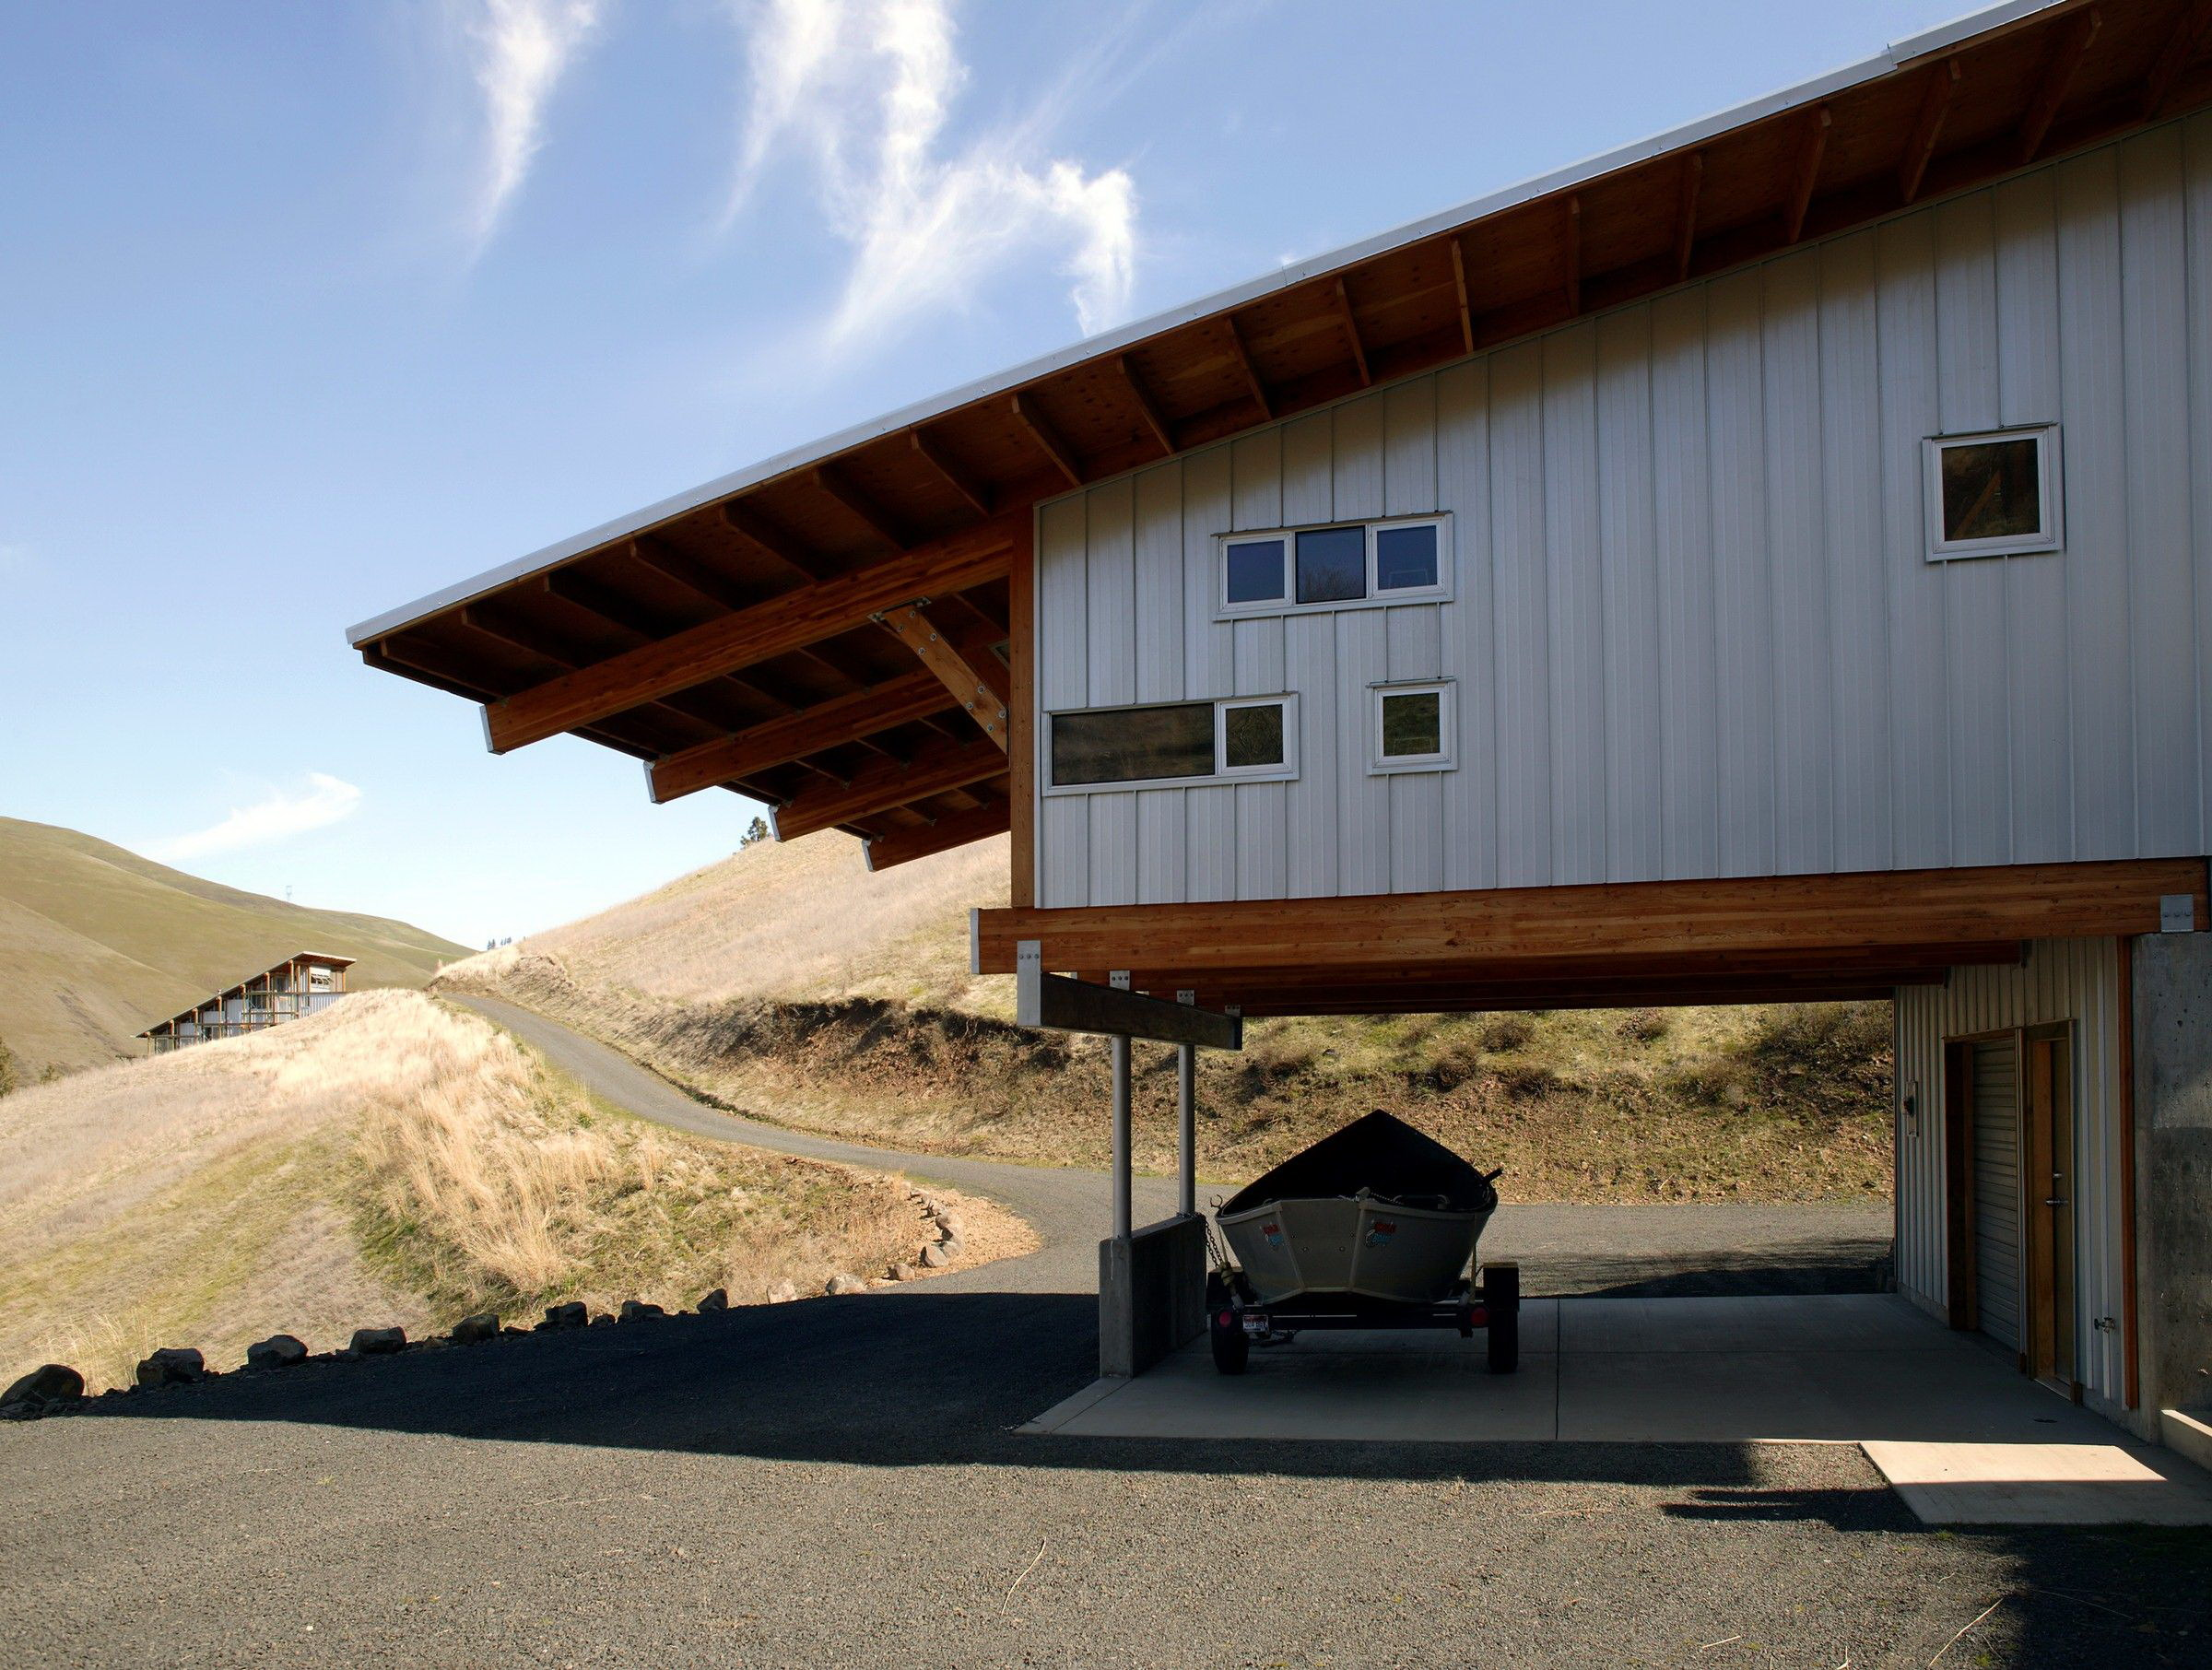 Canyon House by Paul Hirzel